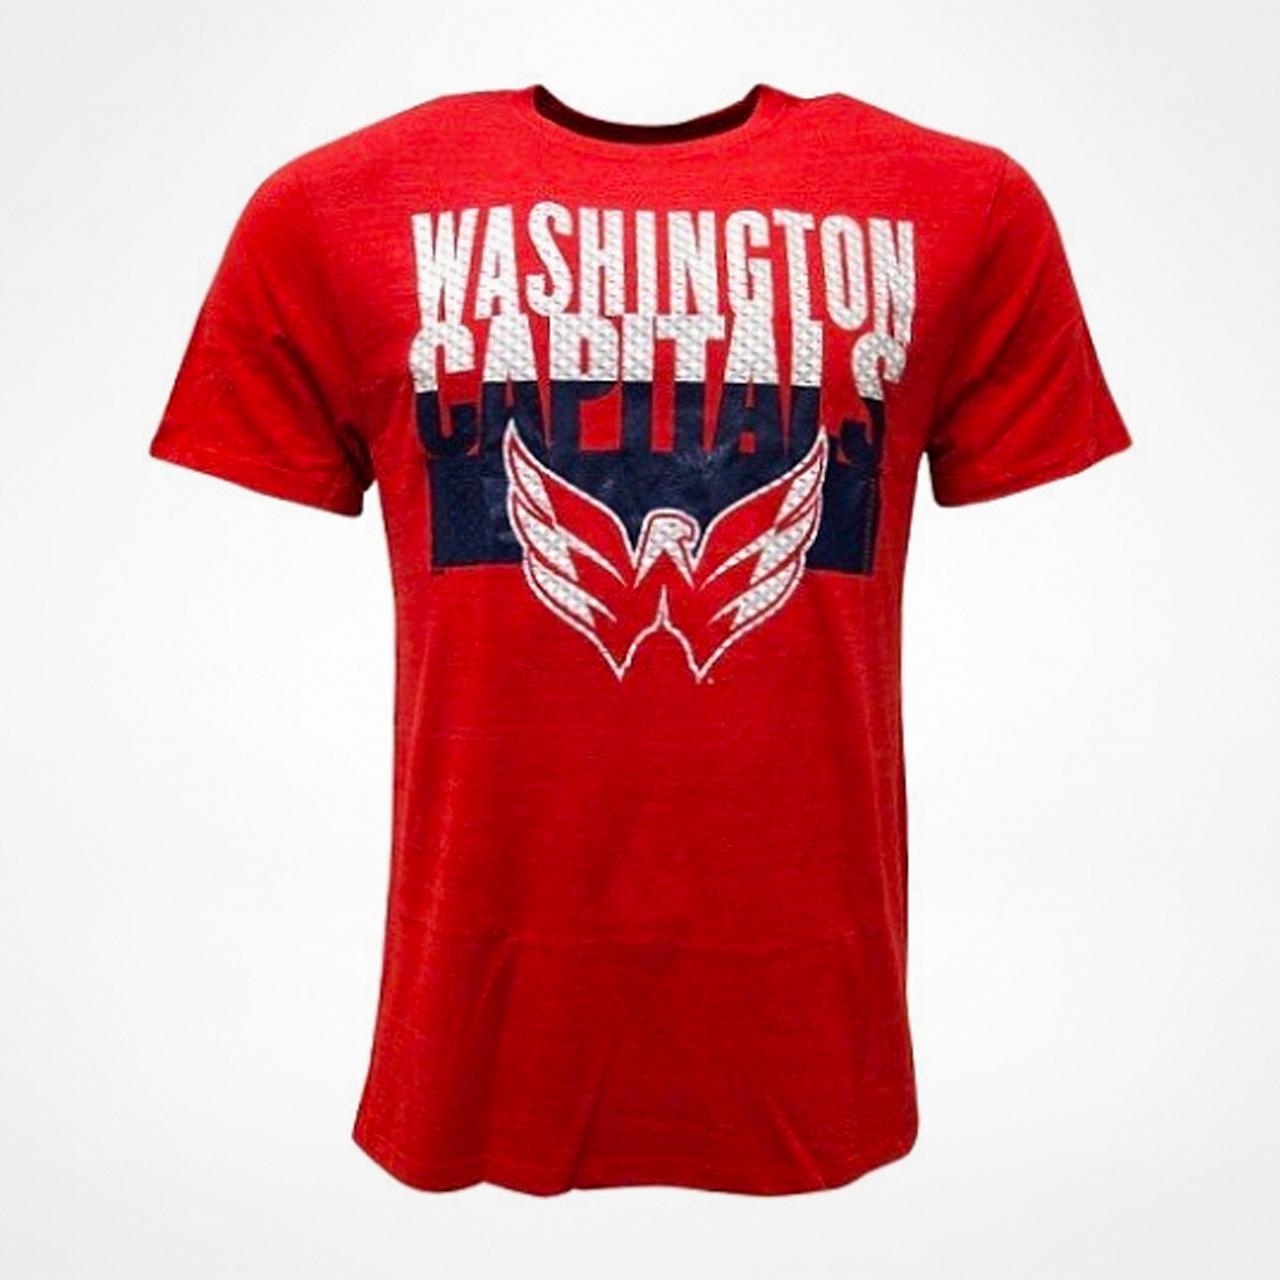 Washington Capitals Split Time T Shirt Hos Supporterprylar